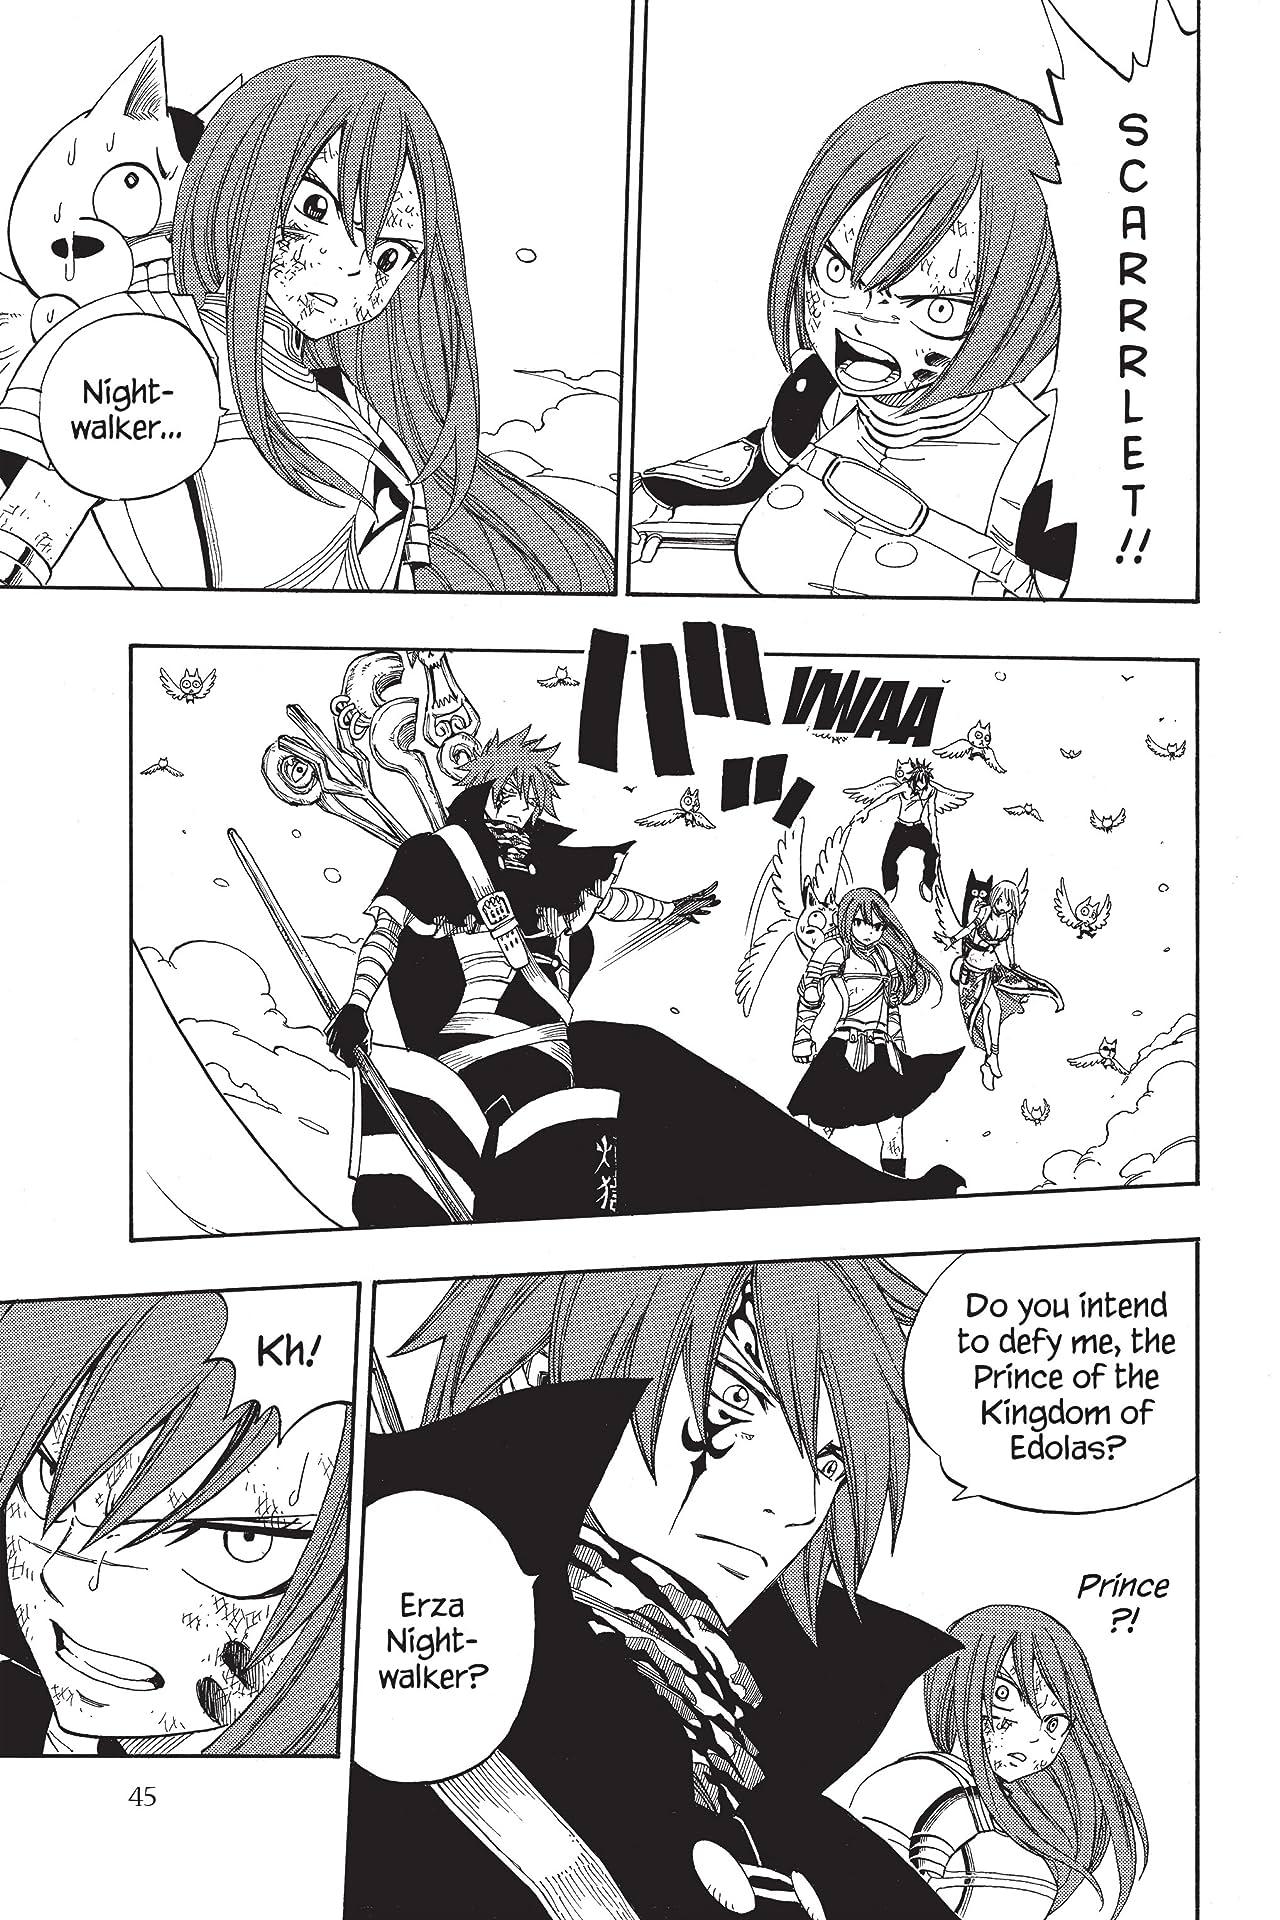 Fairy Tail #190